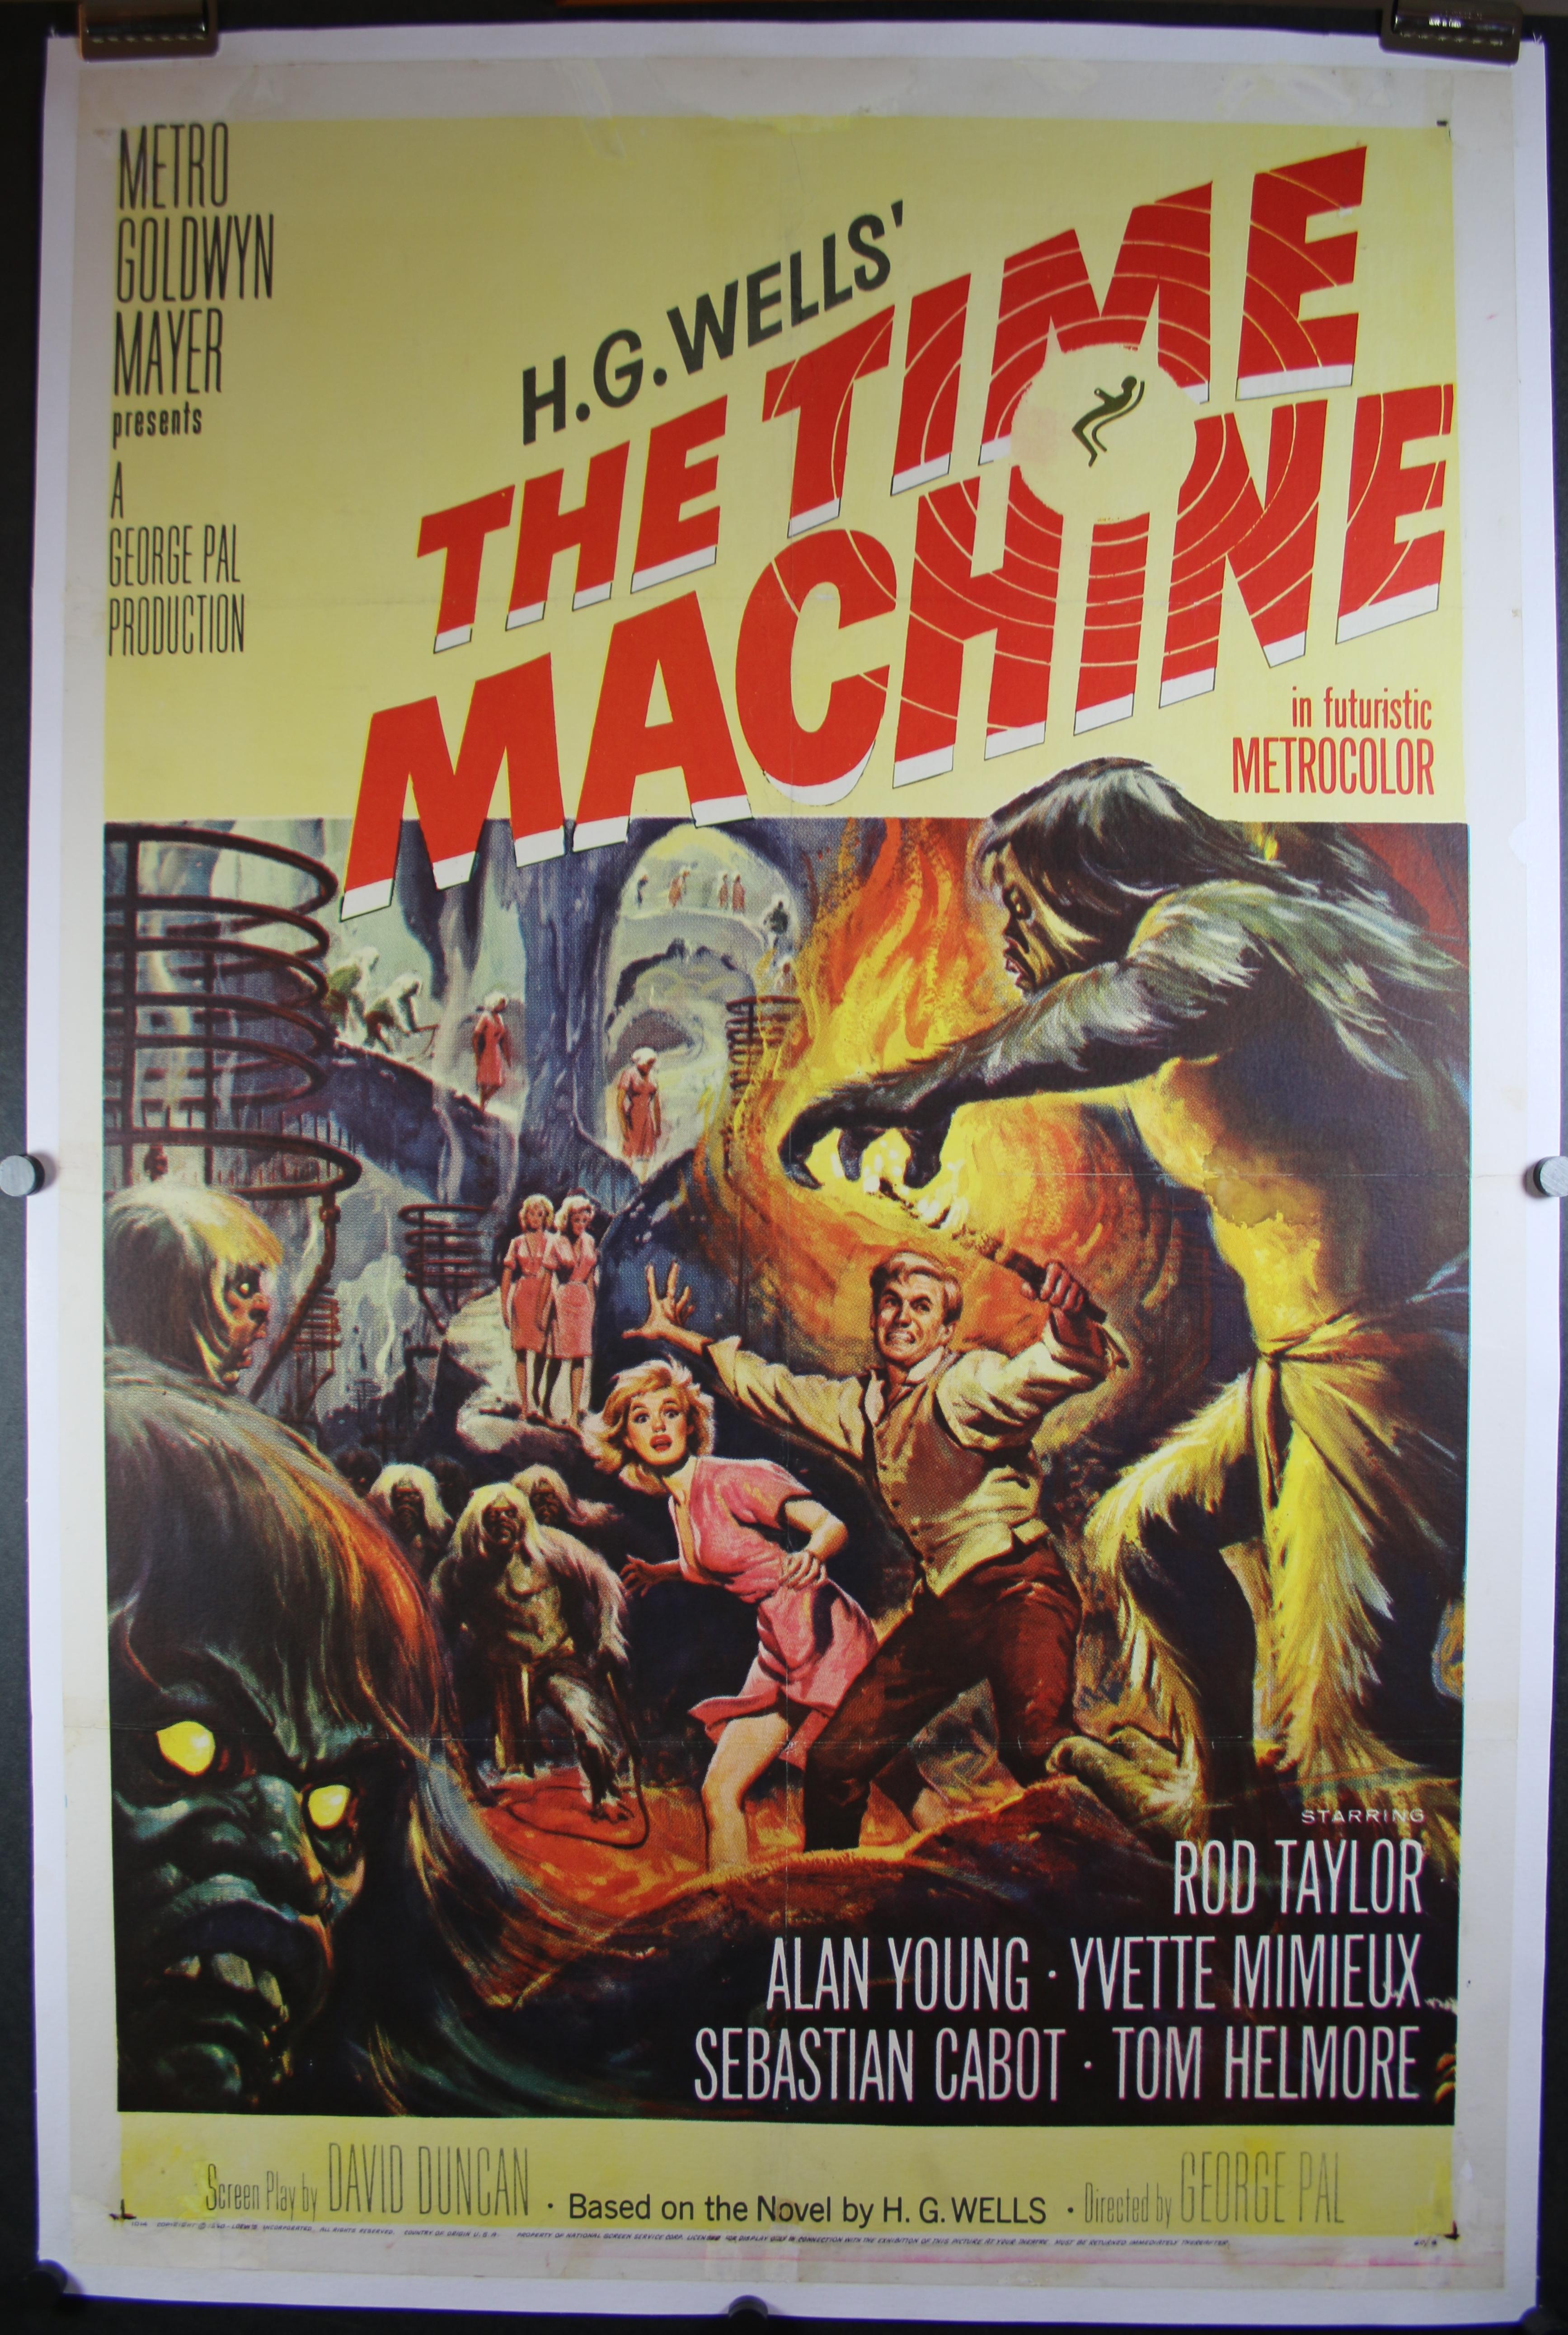 Time Machine 4571LB